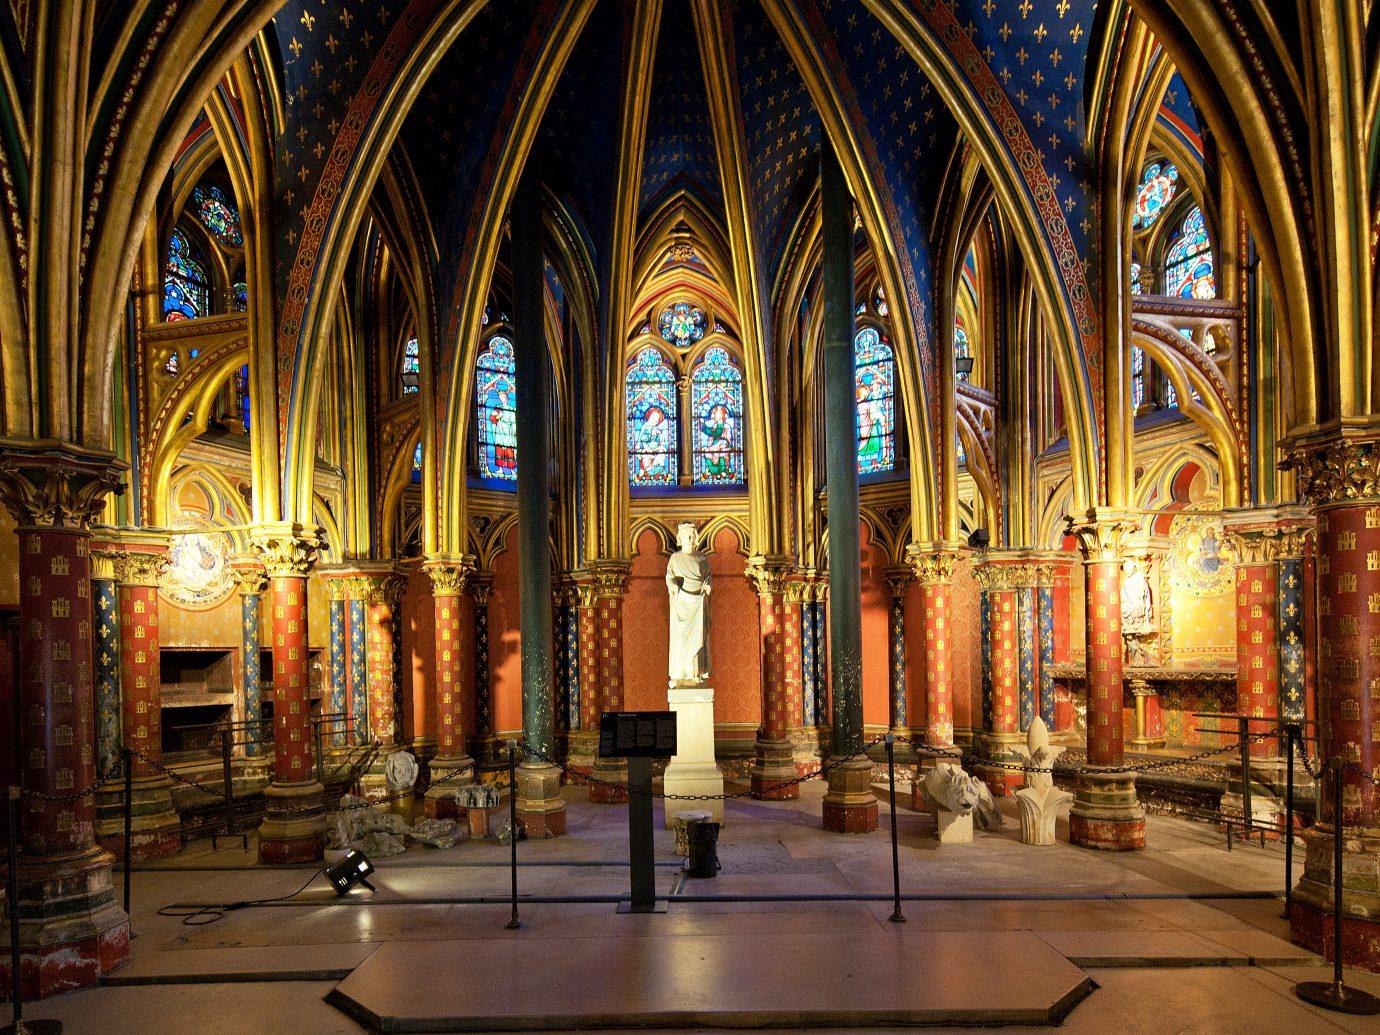 The Sainte-Chapelle is a royal medieval Gothic chapel in Paris, France.